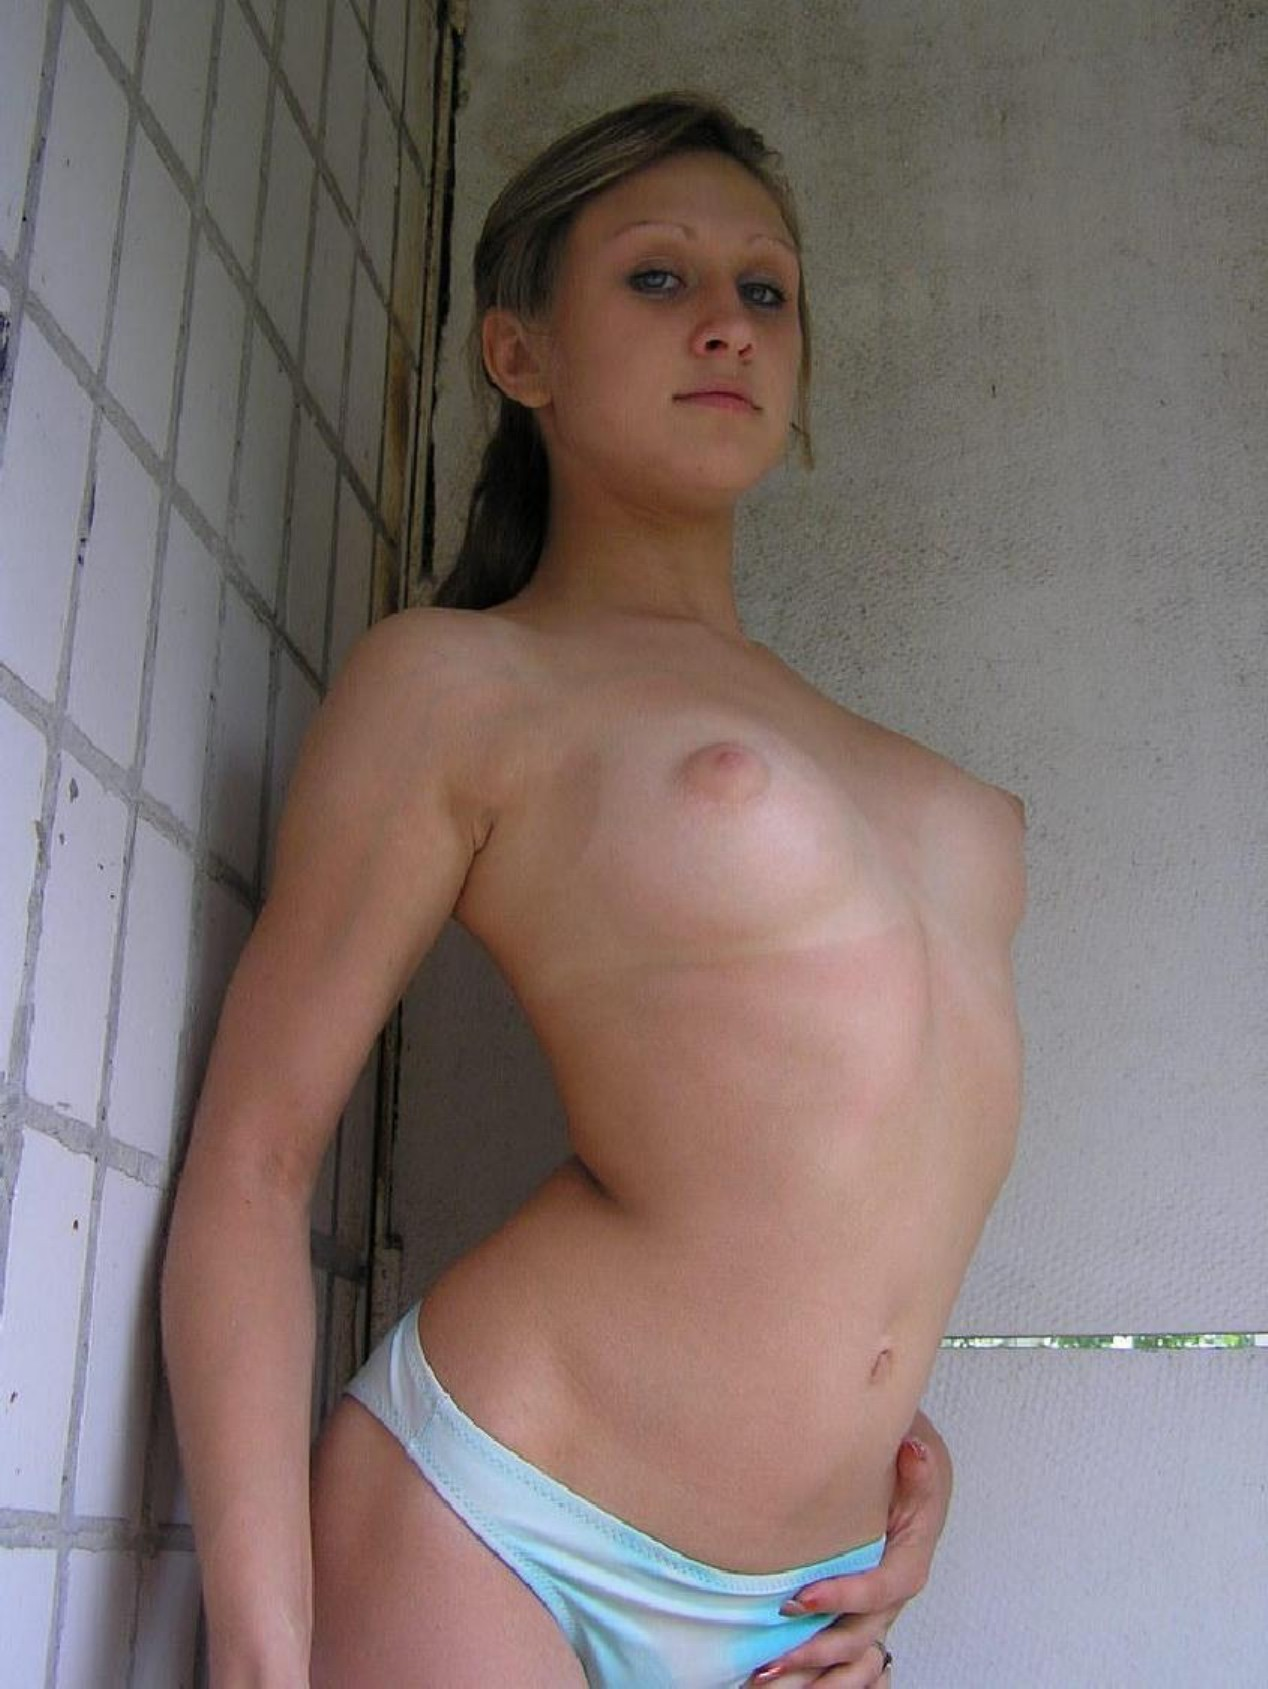 FREE Icdn Ru Nudist Girl  QPORNXcom